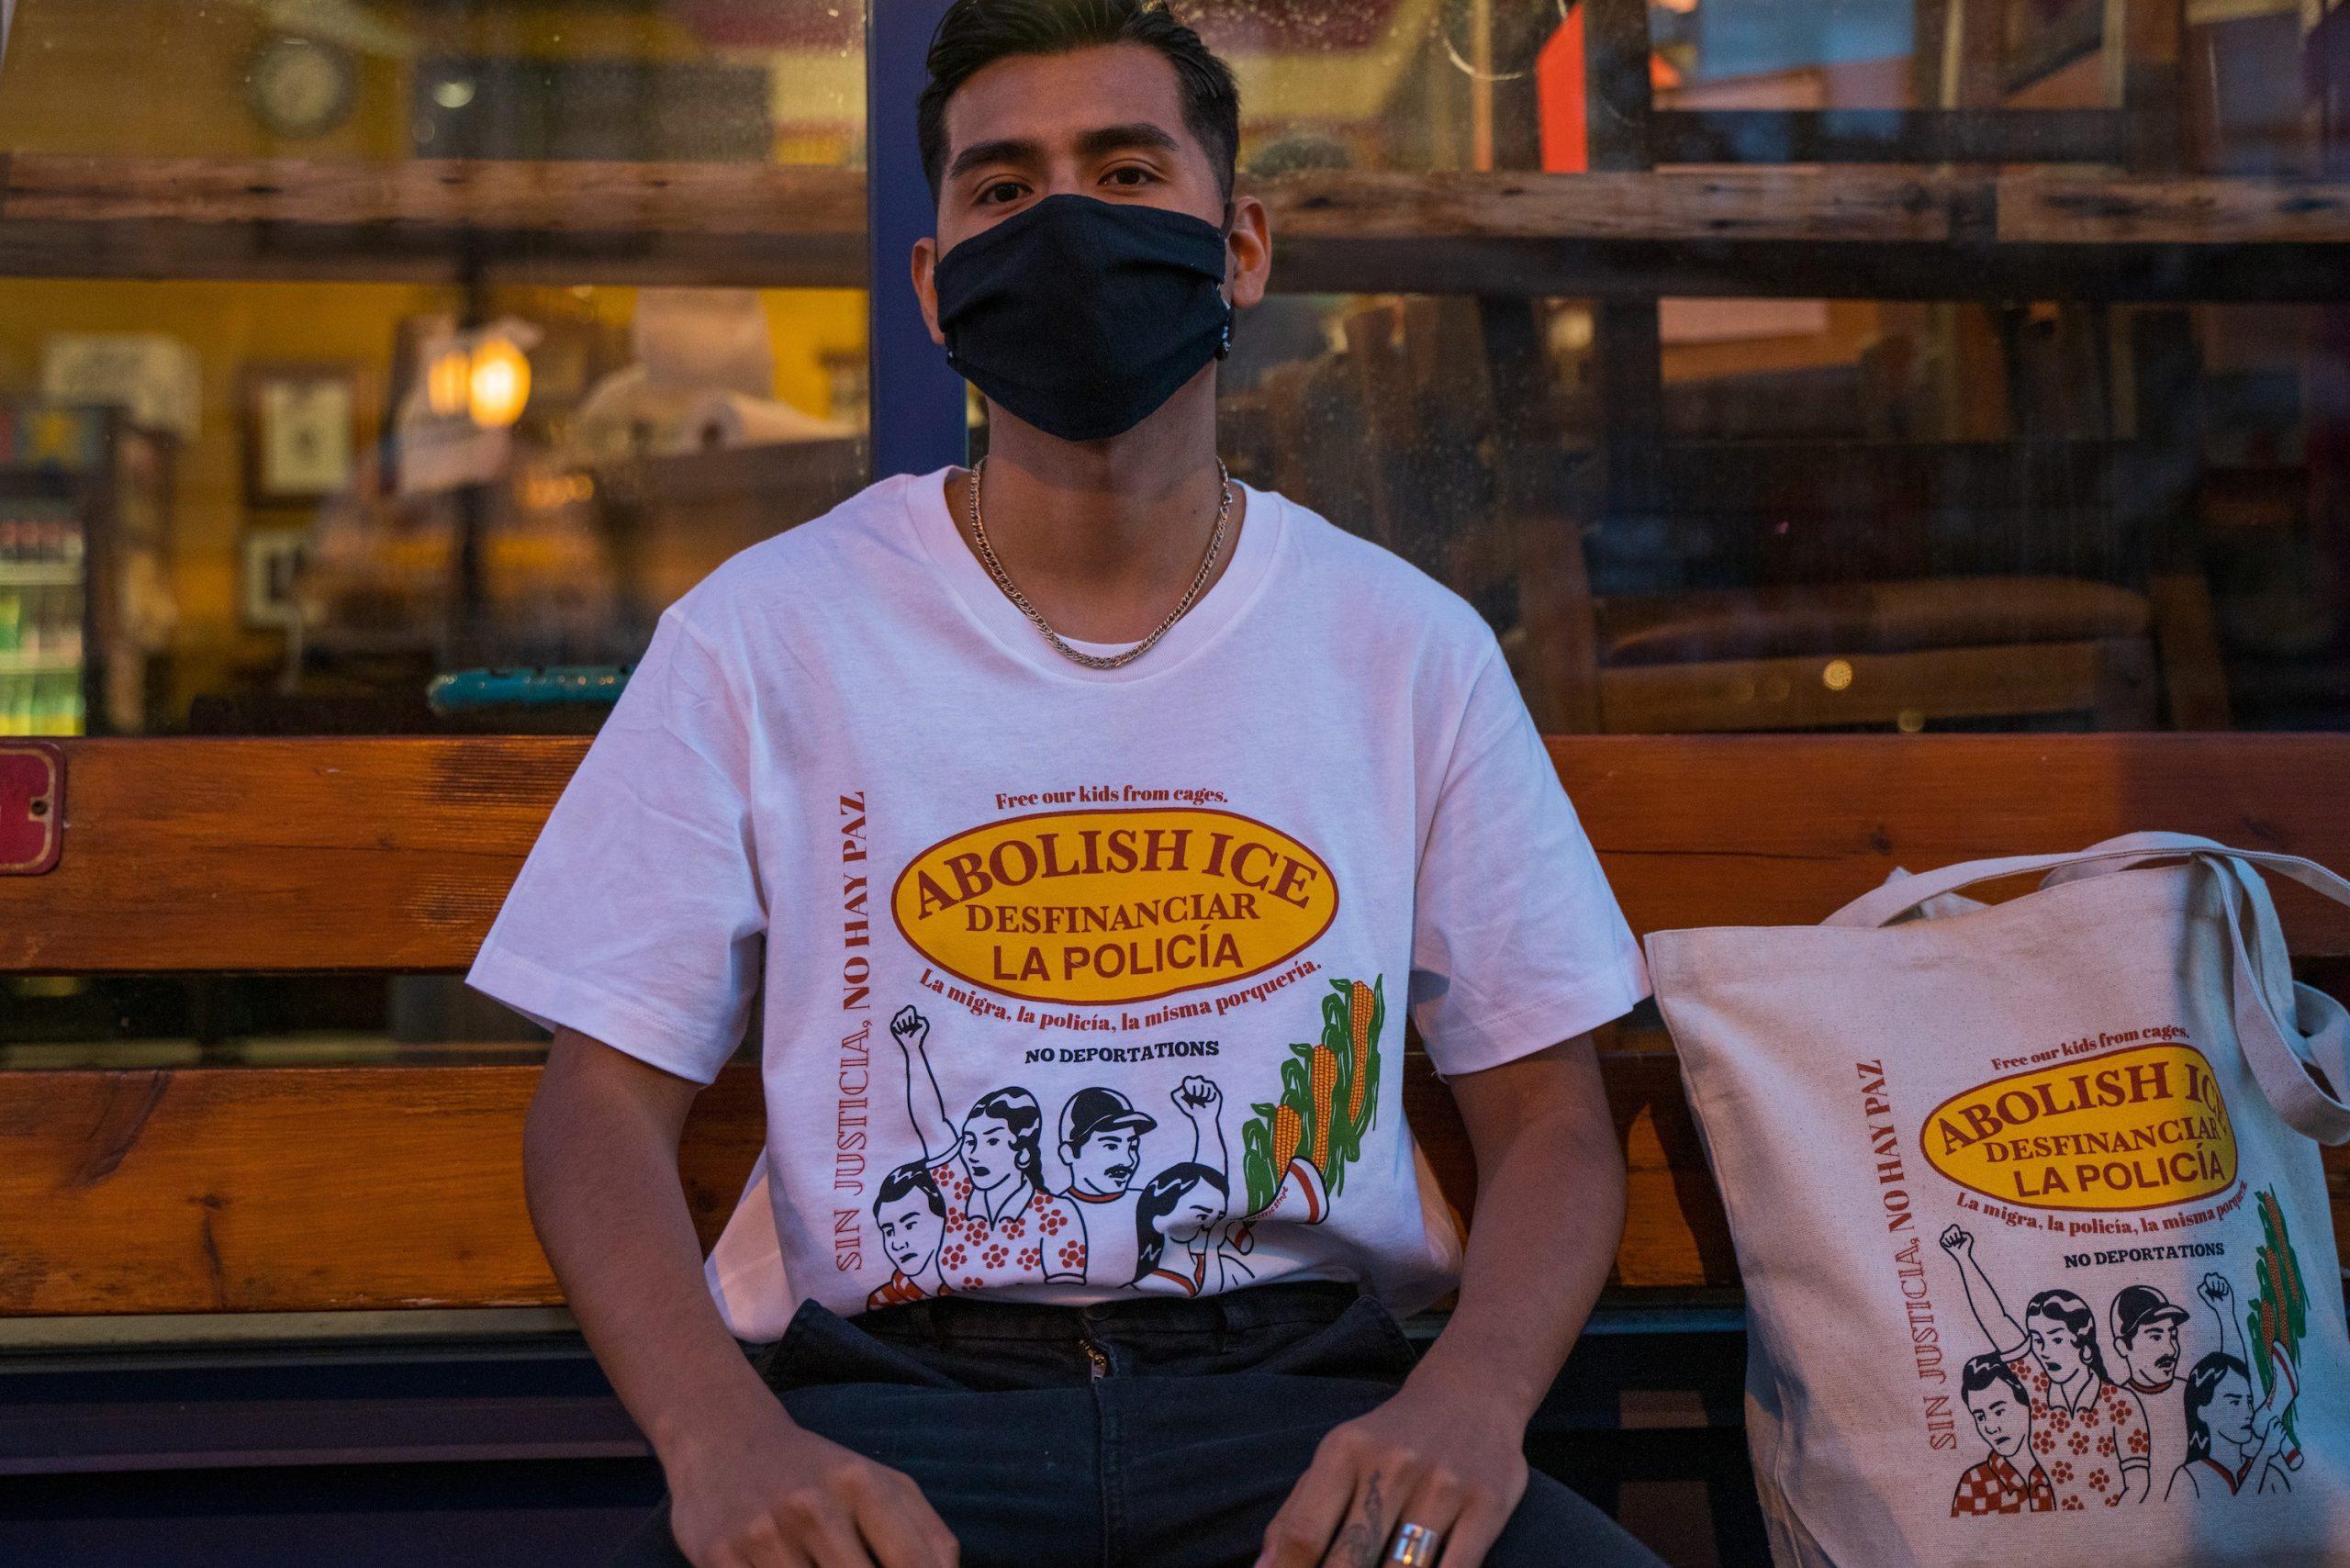 Fernando Delgado shows off his T-shirt and tote bag.